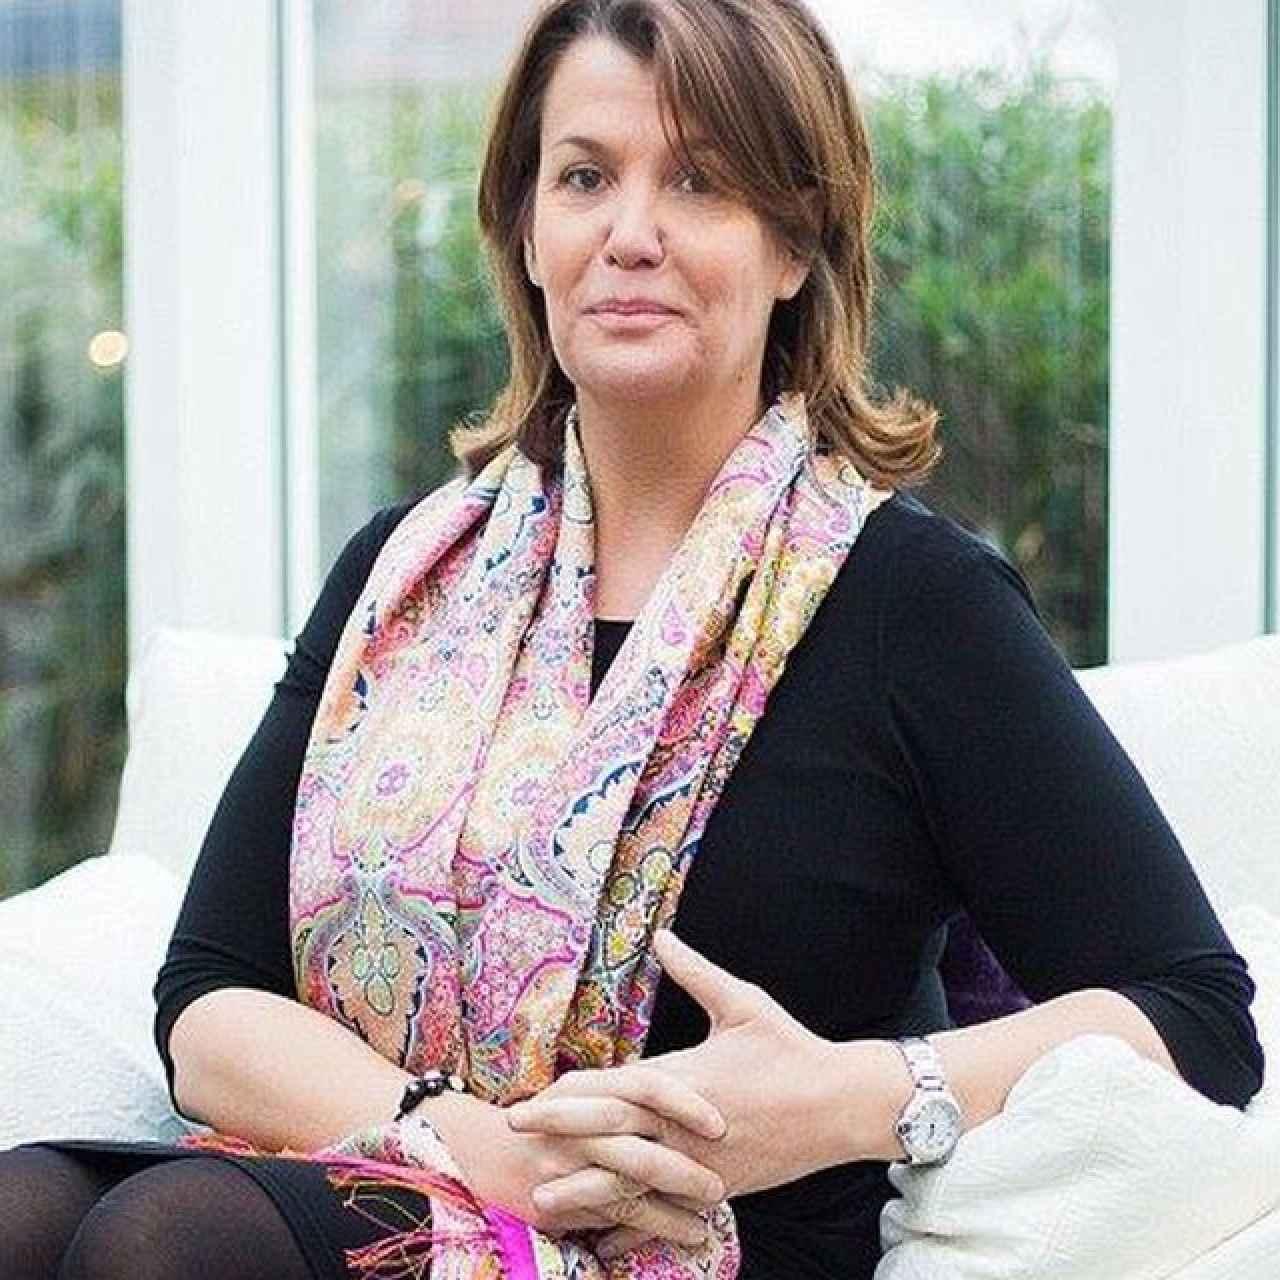 Ingrid Sartiau, la supuesta hija ilegítima de Juan Carlos I.